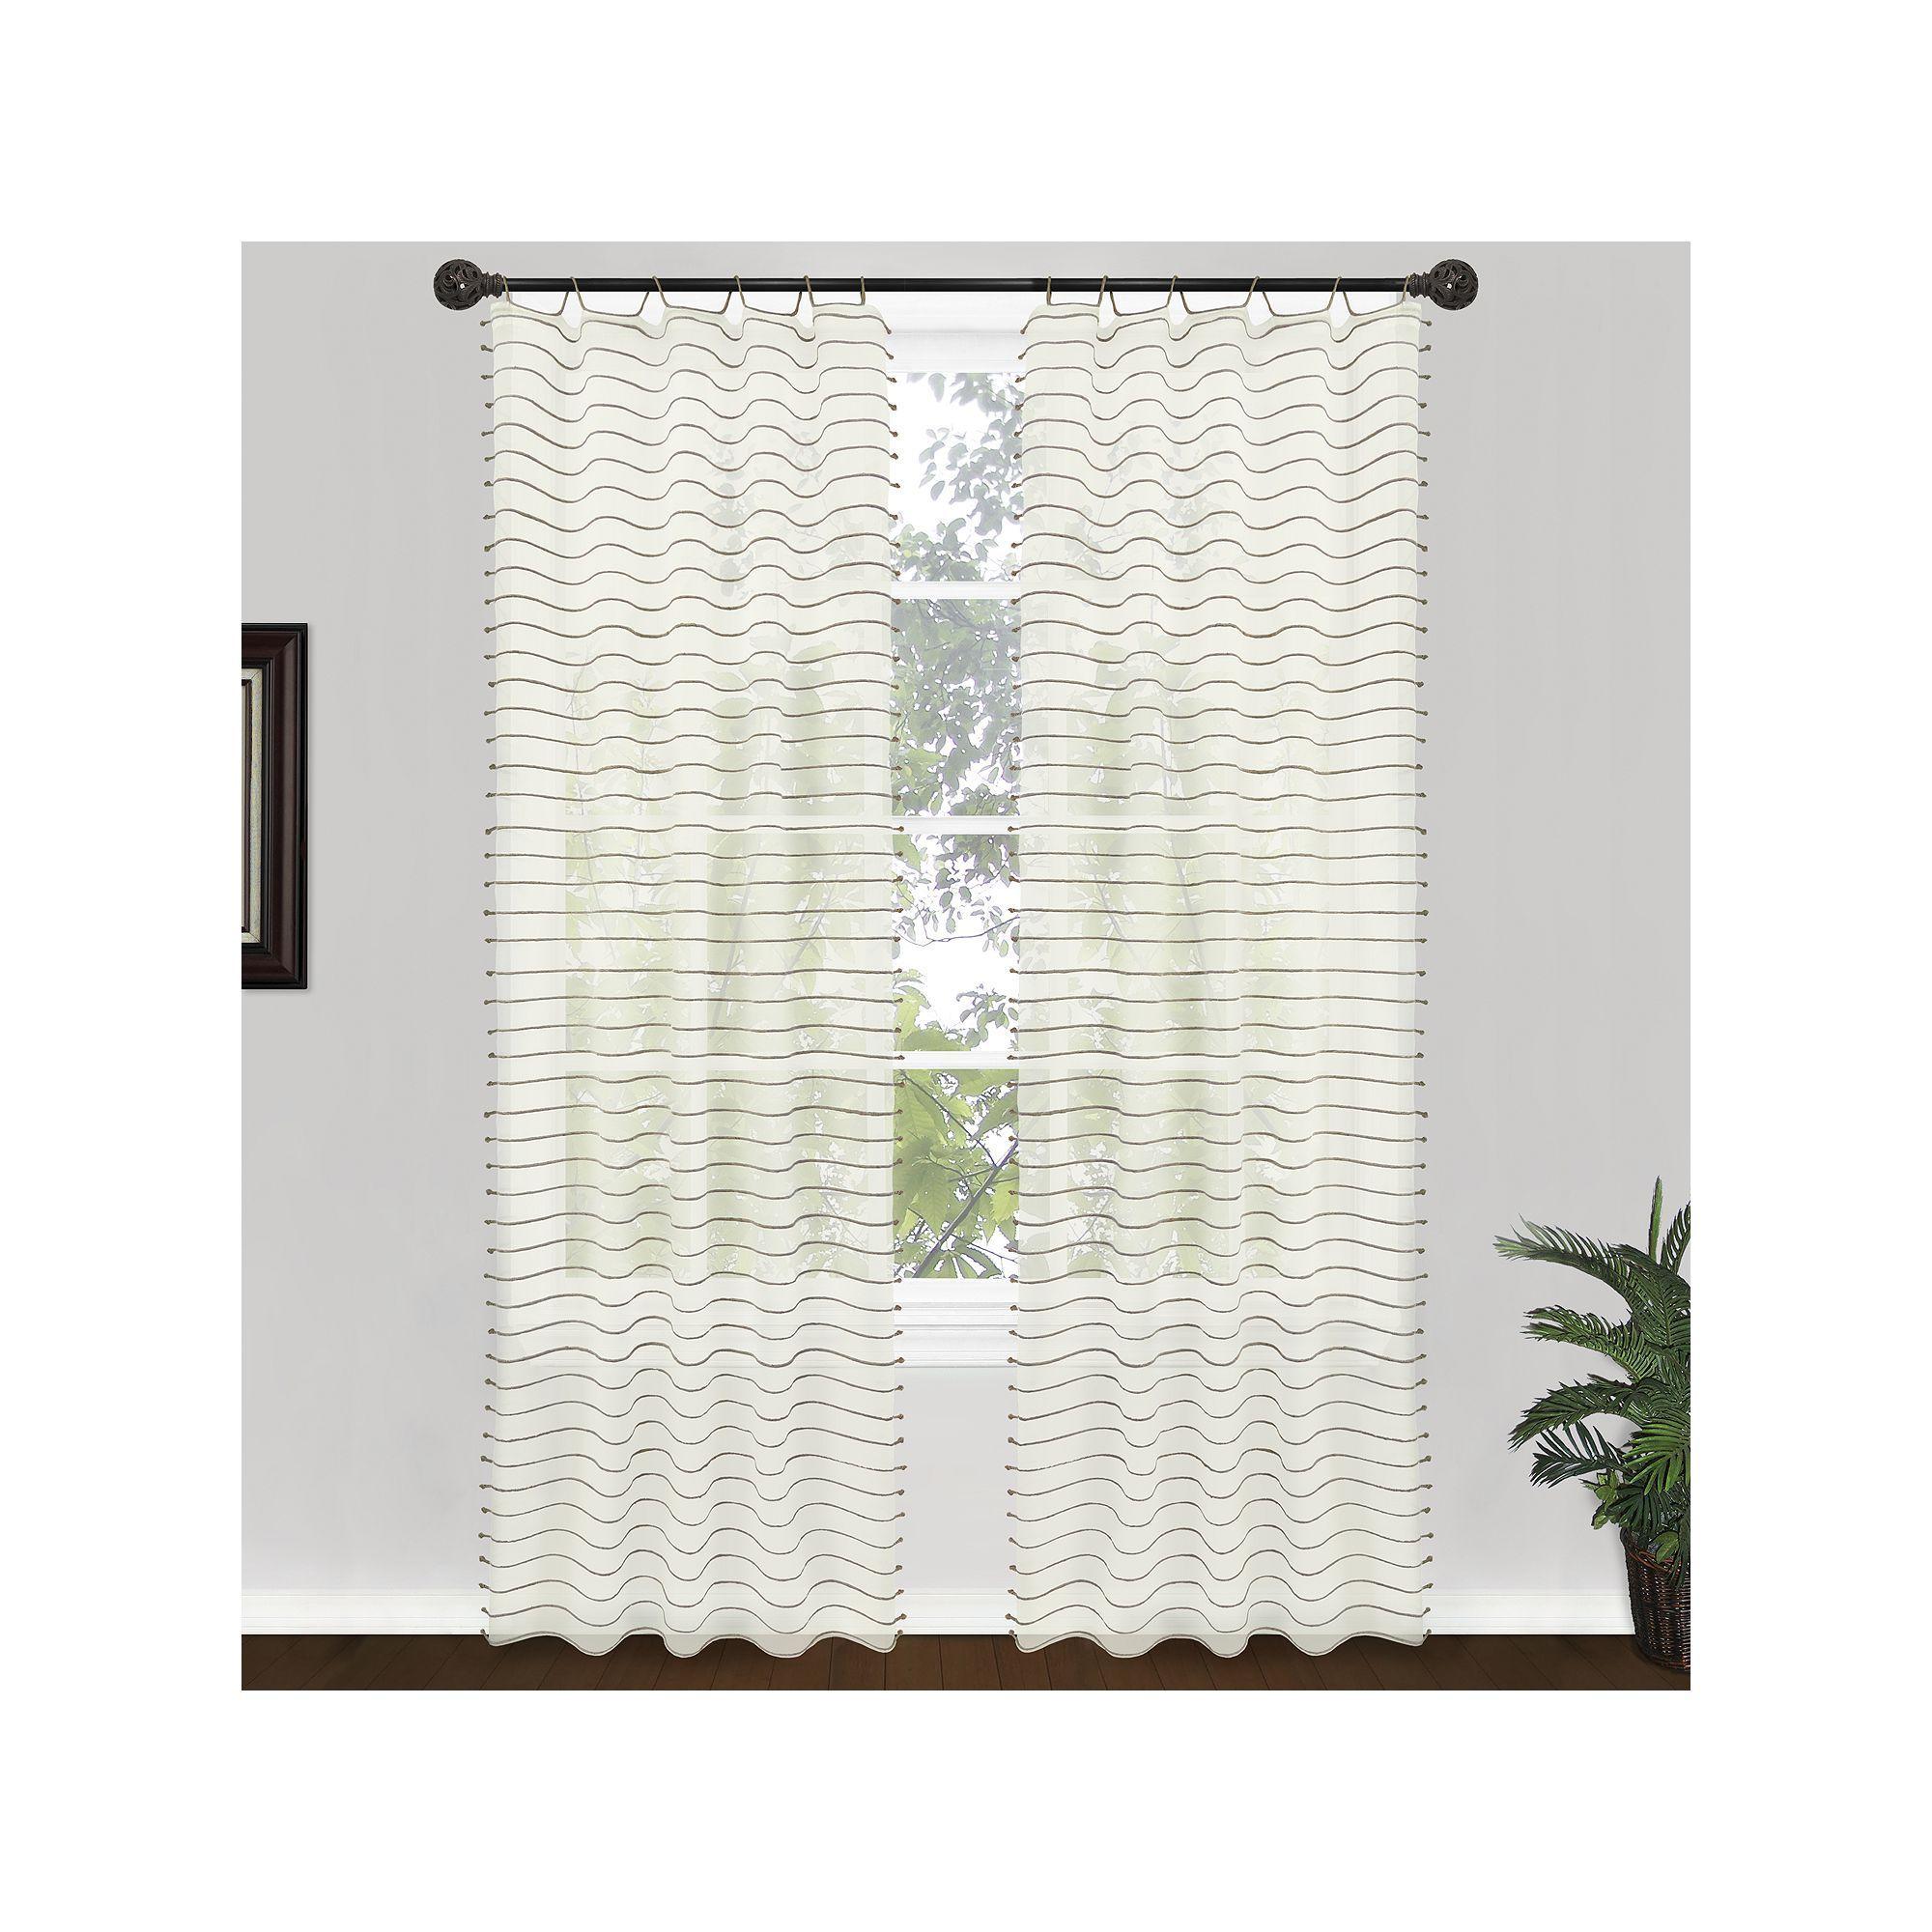 Park b smith jordan serpentine window panel uu x uu green